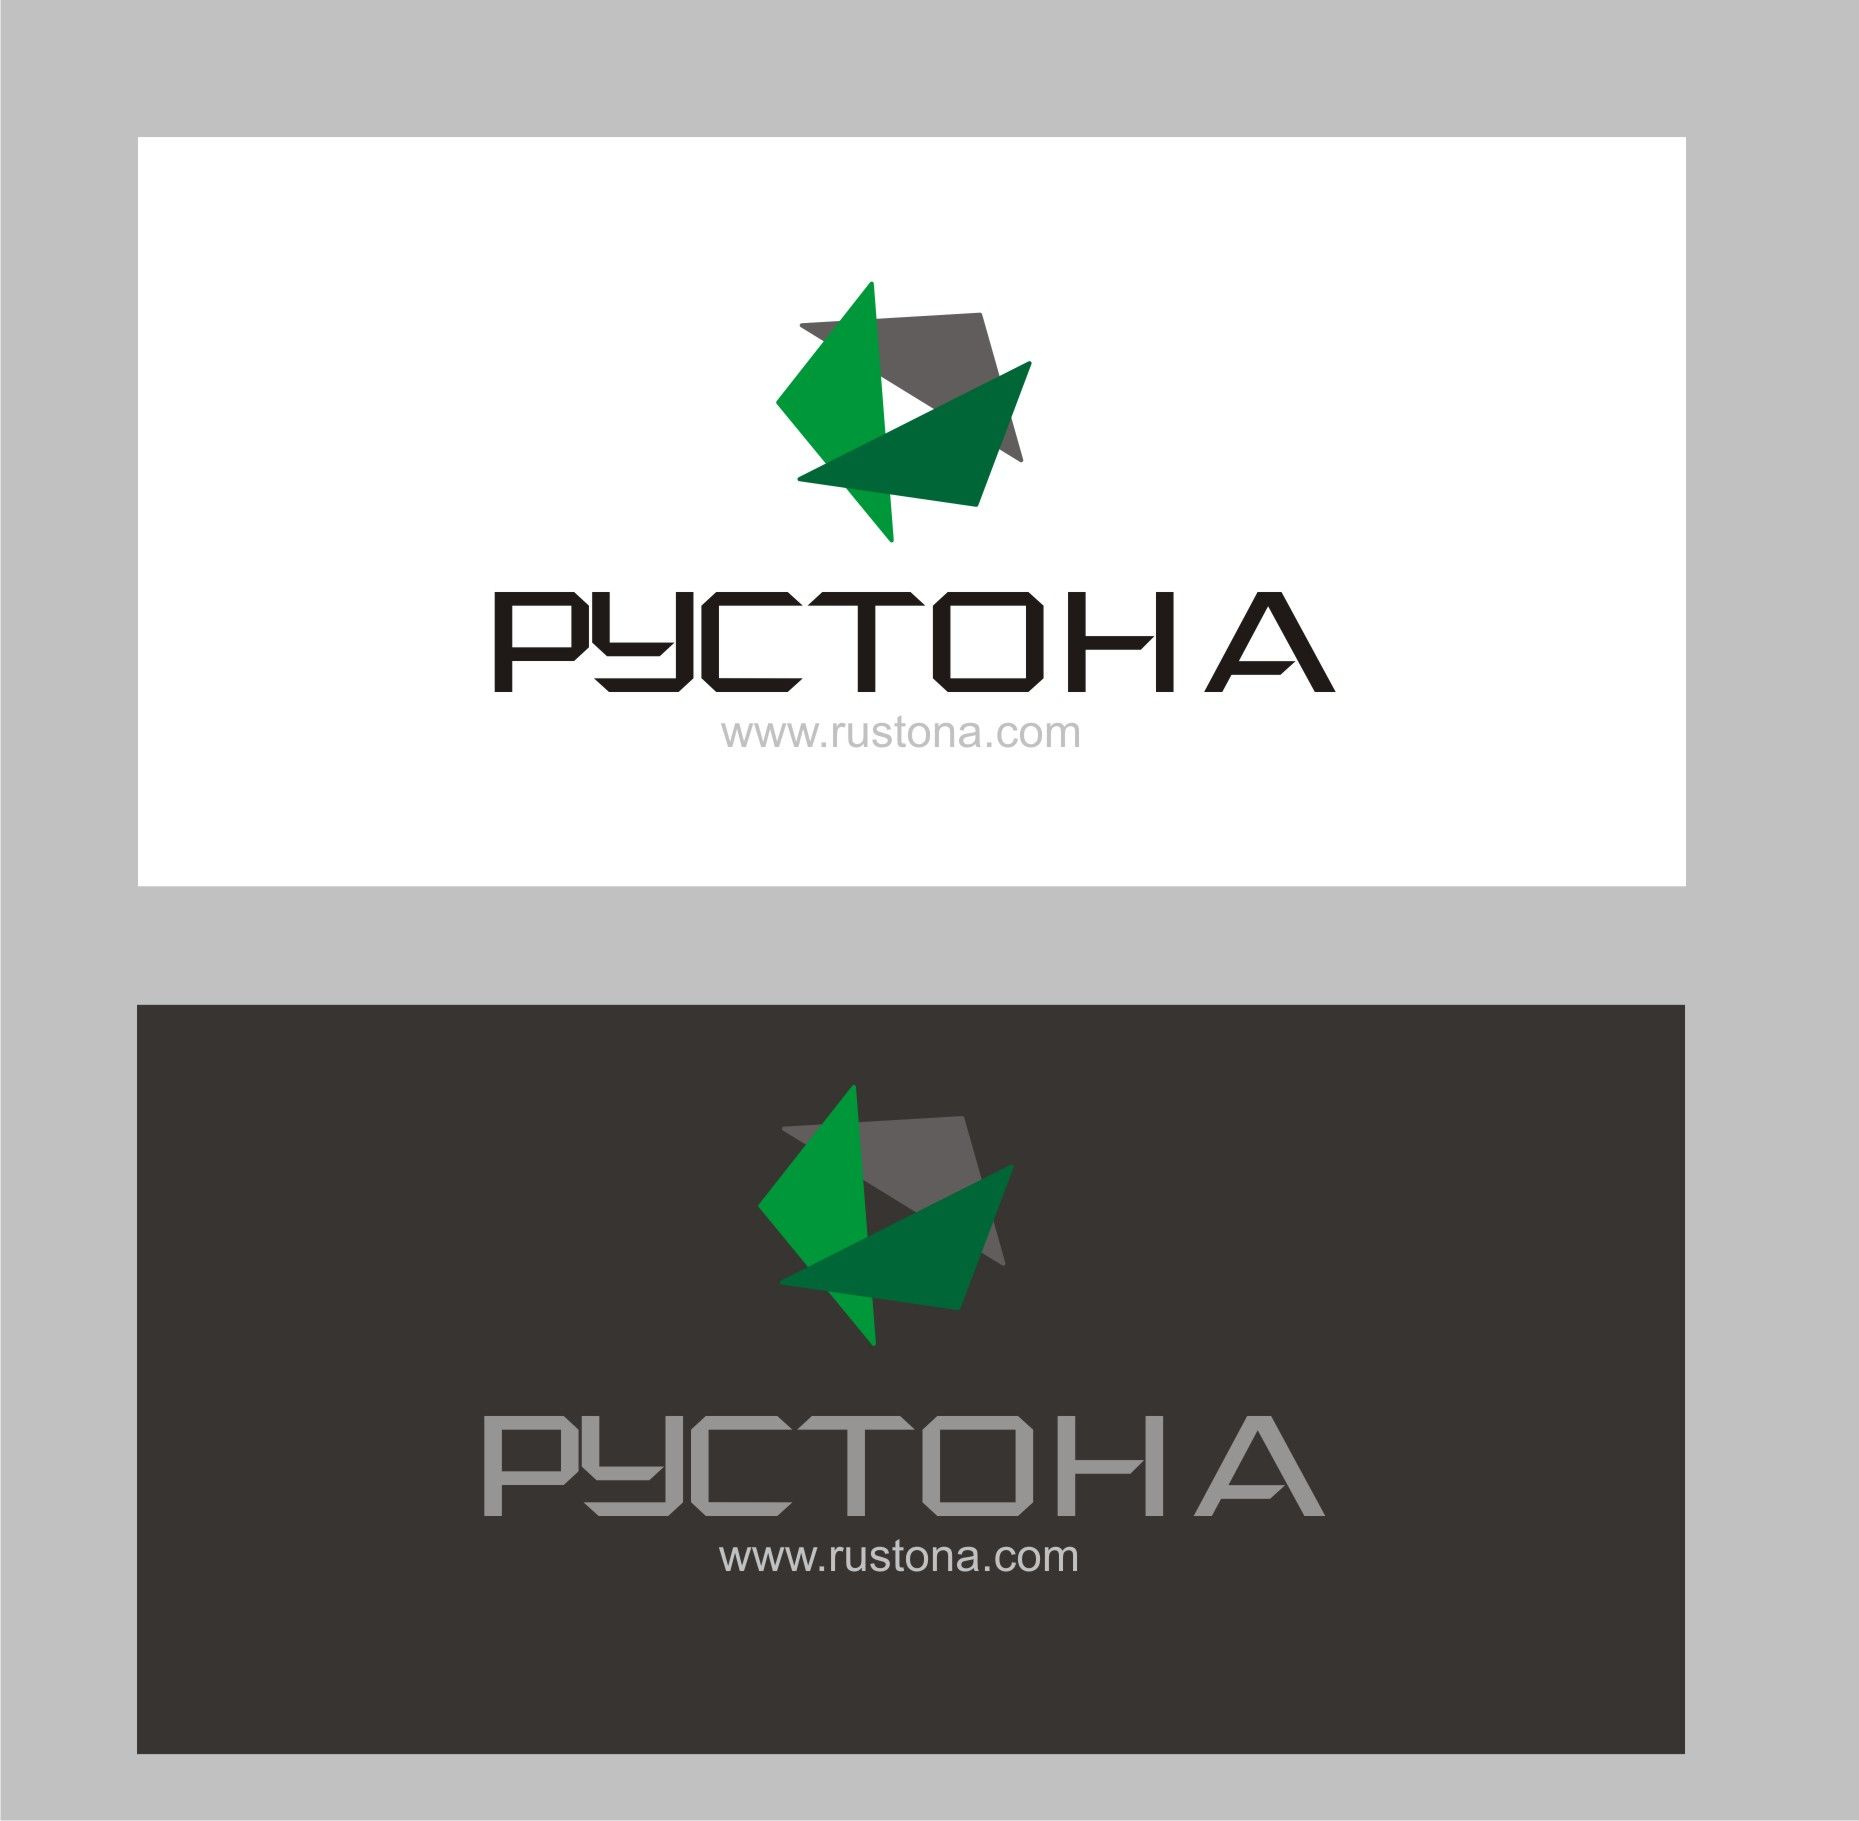 Логотип для компании Рустона (www.rustona.com) - дизайнер dbyjuhfl